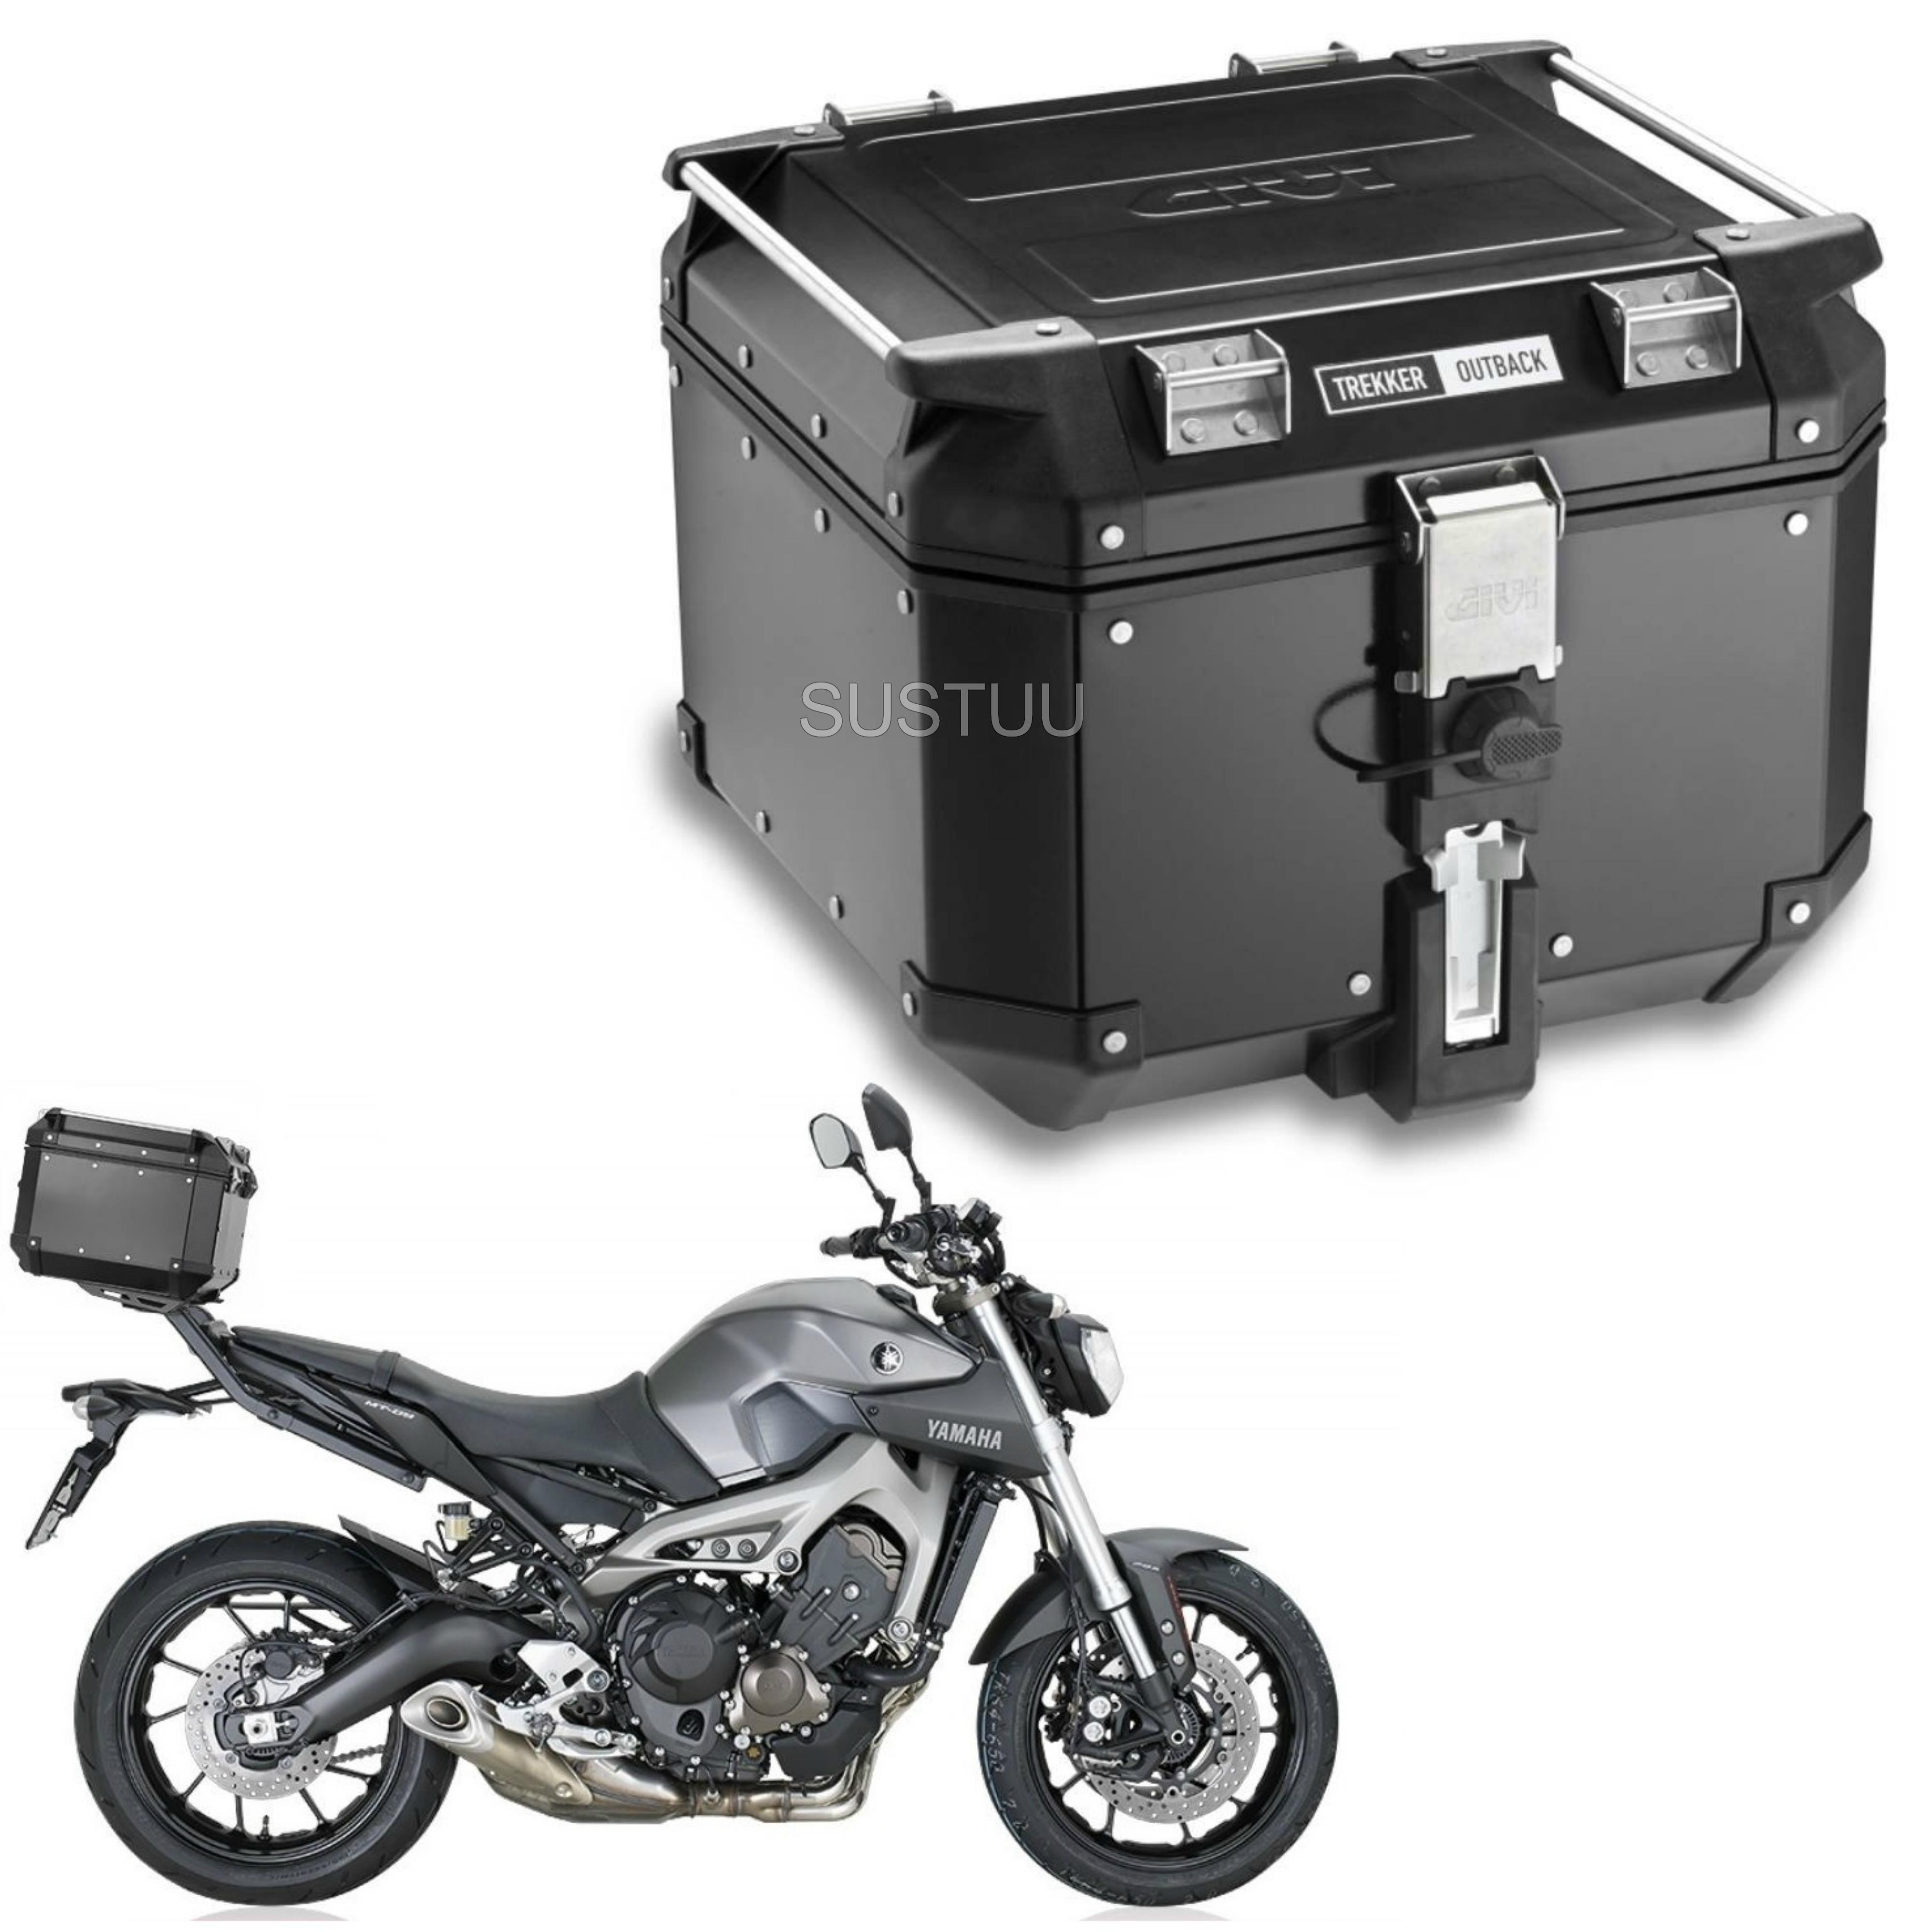 Givi OBK42|Trekker Outback Motorcycle Top Box-Case|42 Liter|Black Line Aluminium